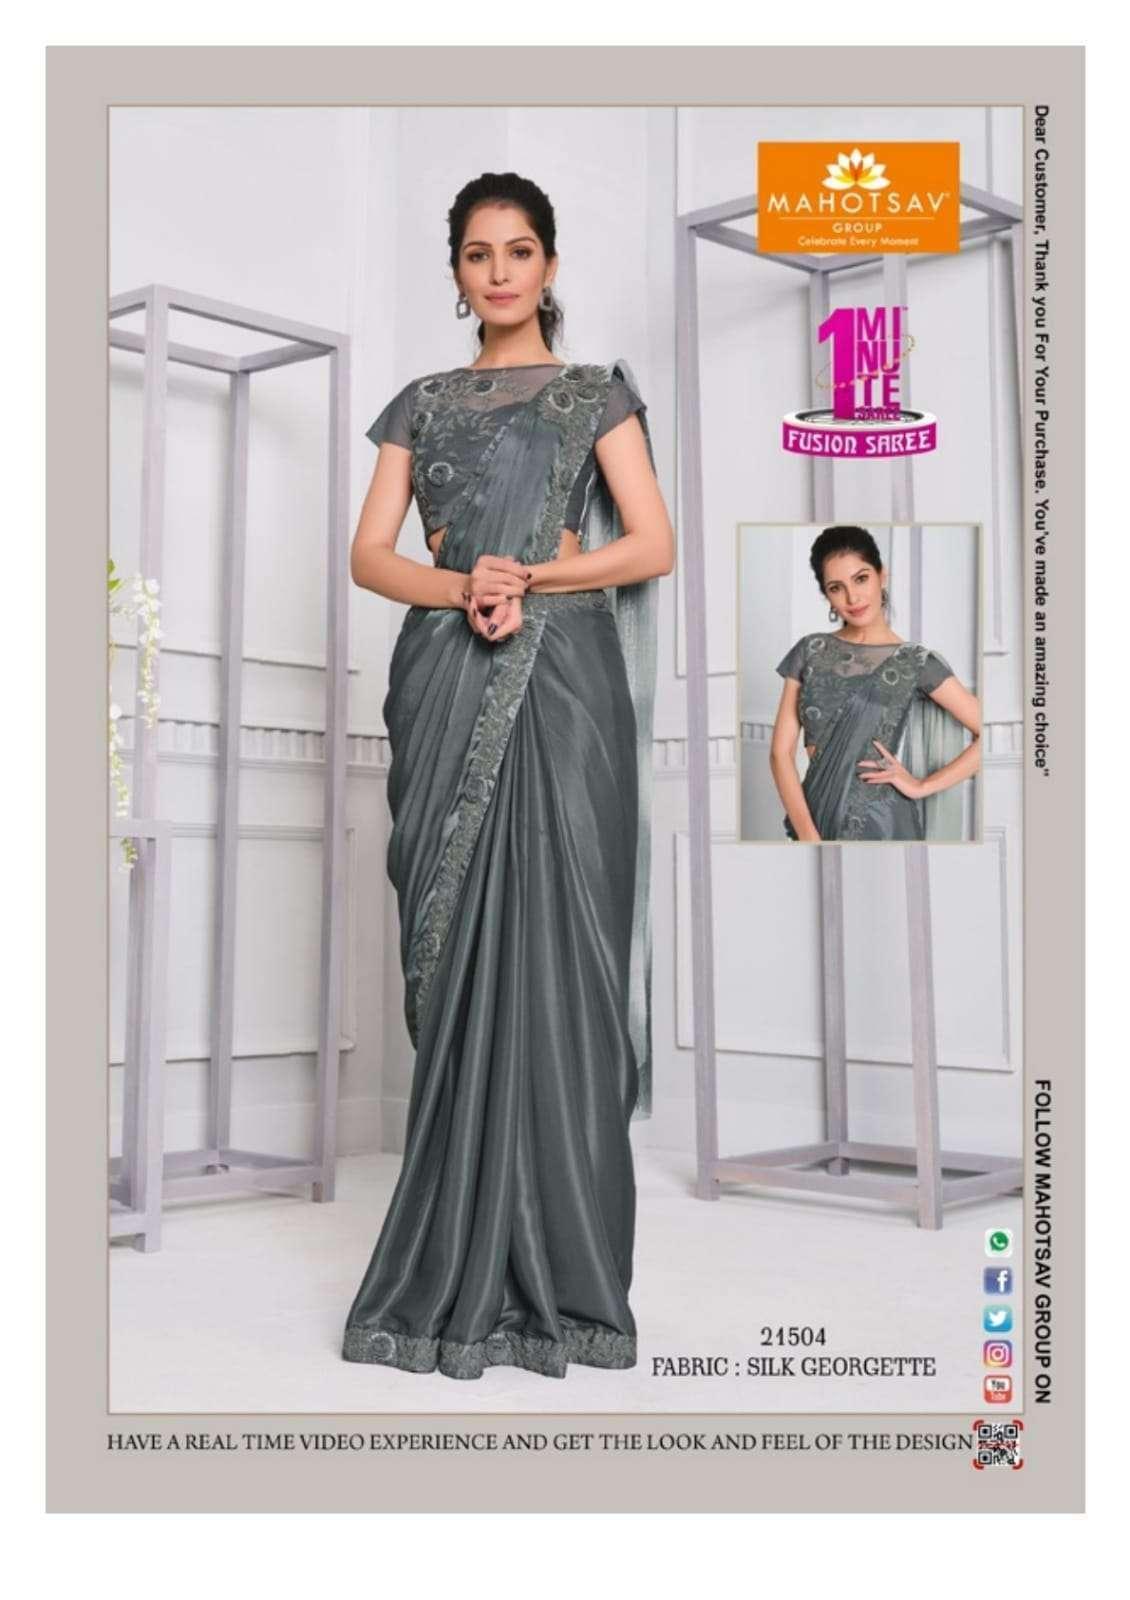 Mahotsav Moh Manthan Izzara 21501 To 215018 Series Fancy Designer Sarees Collection 21504